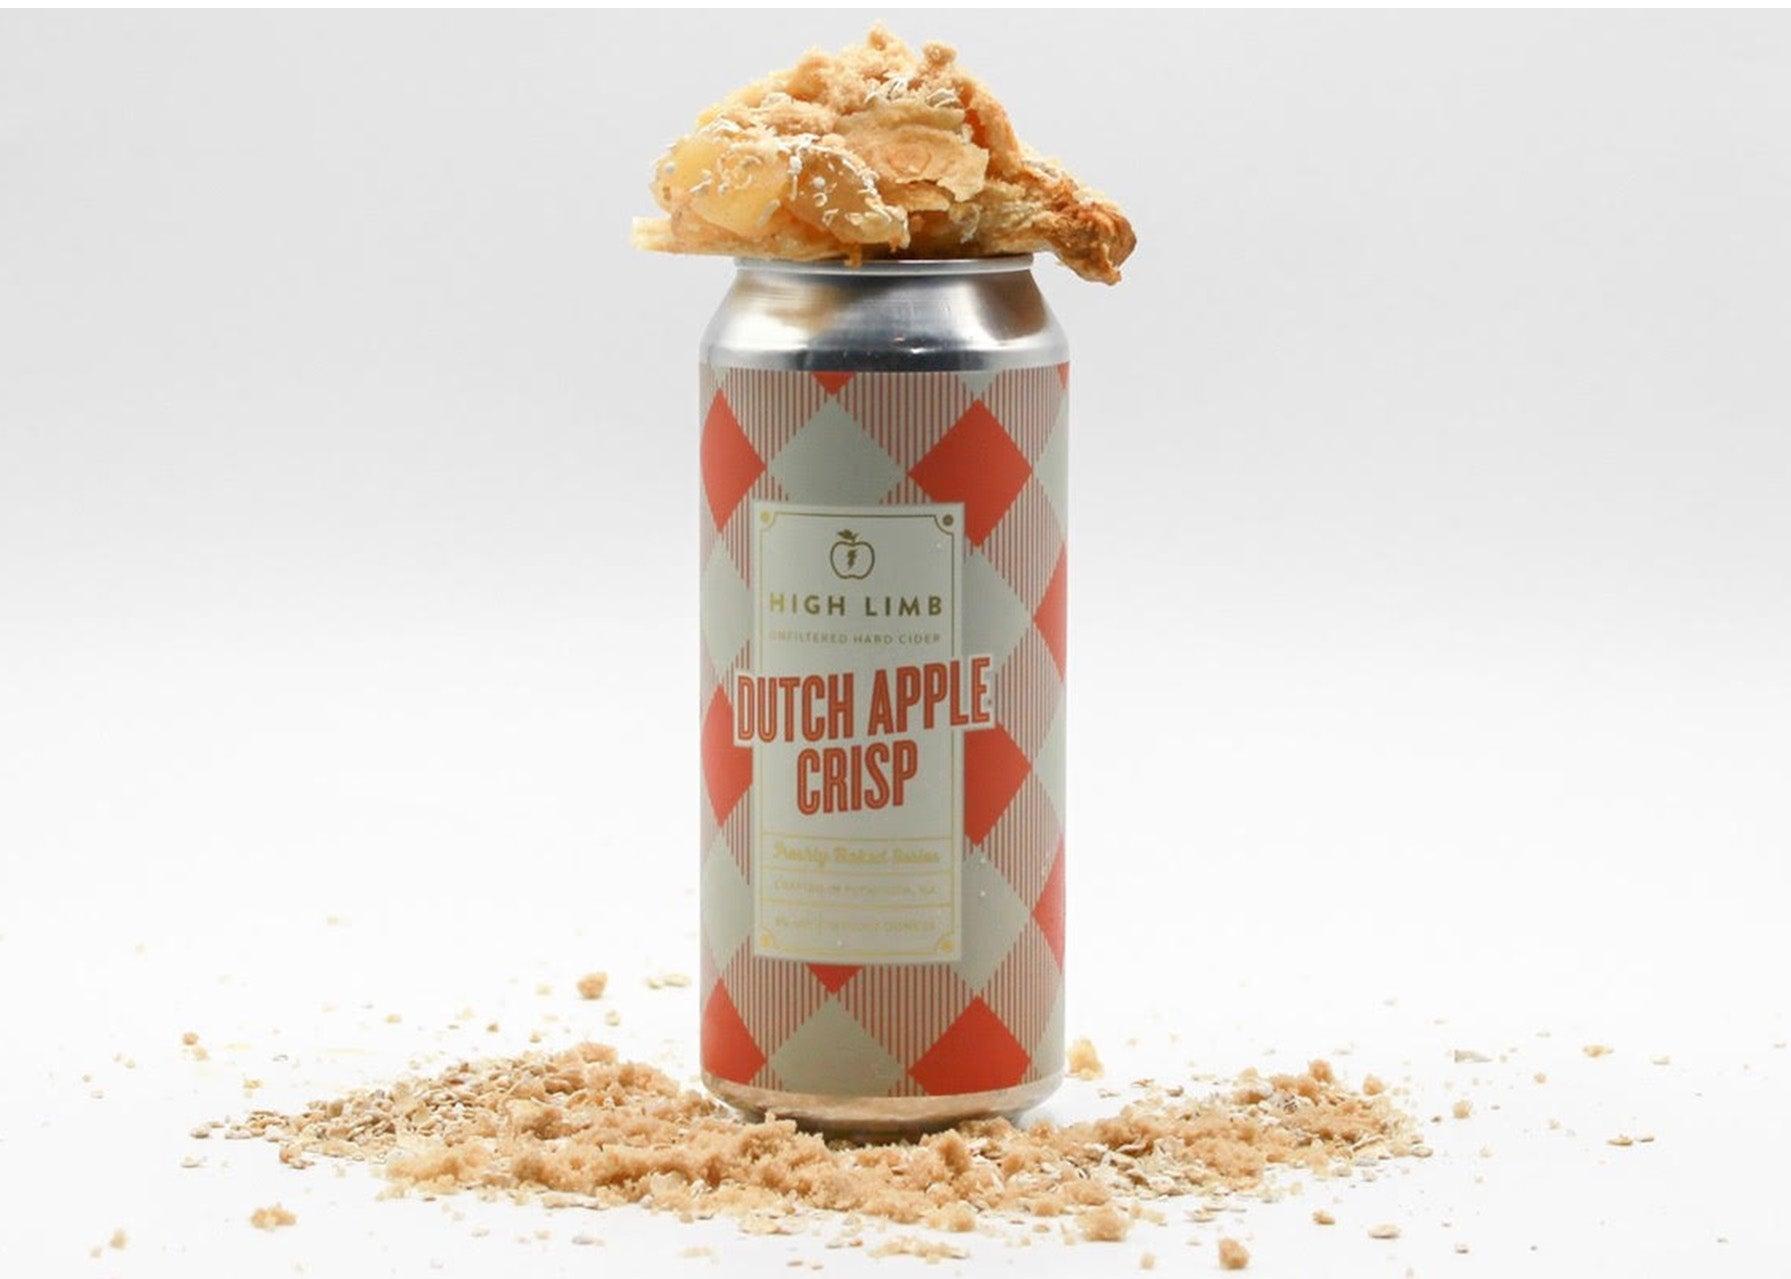 Dutch Apple Crisp at High Limb